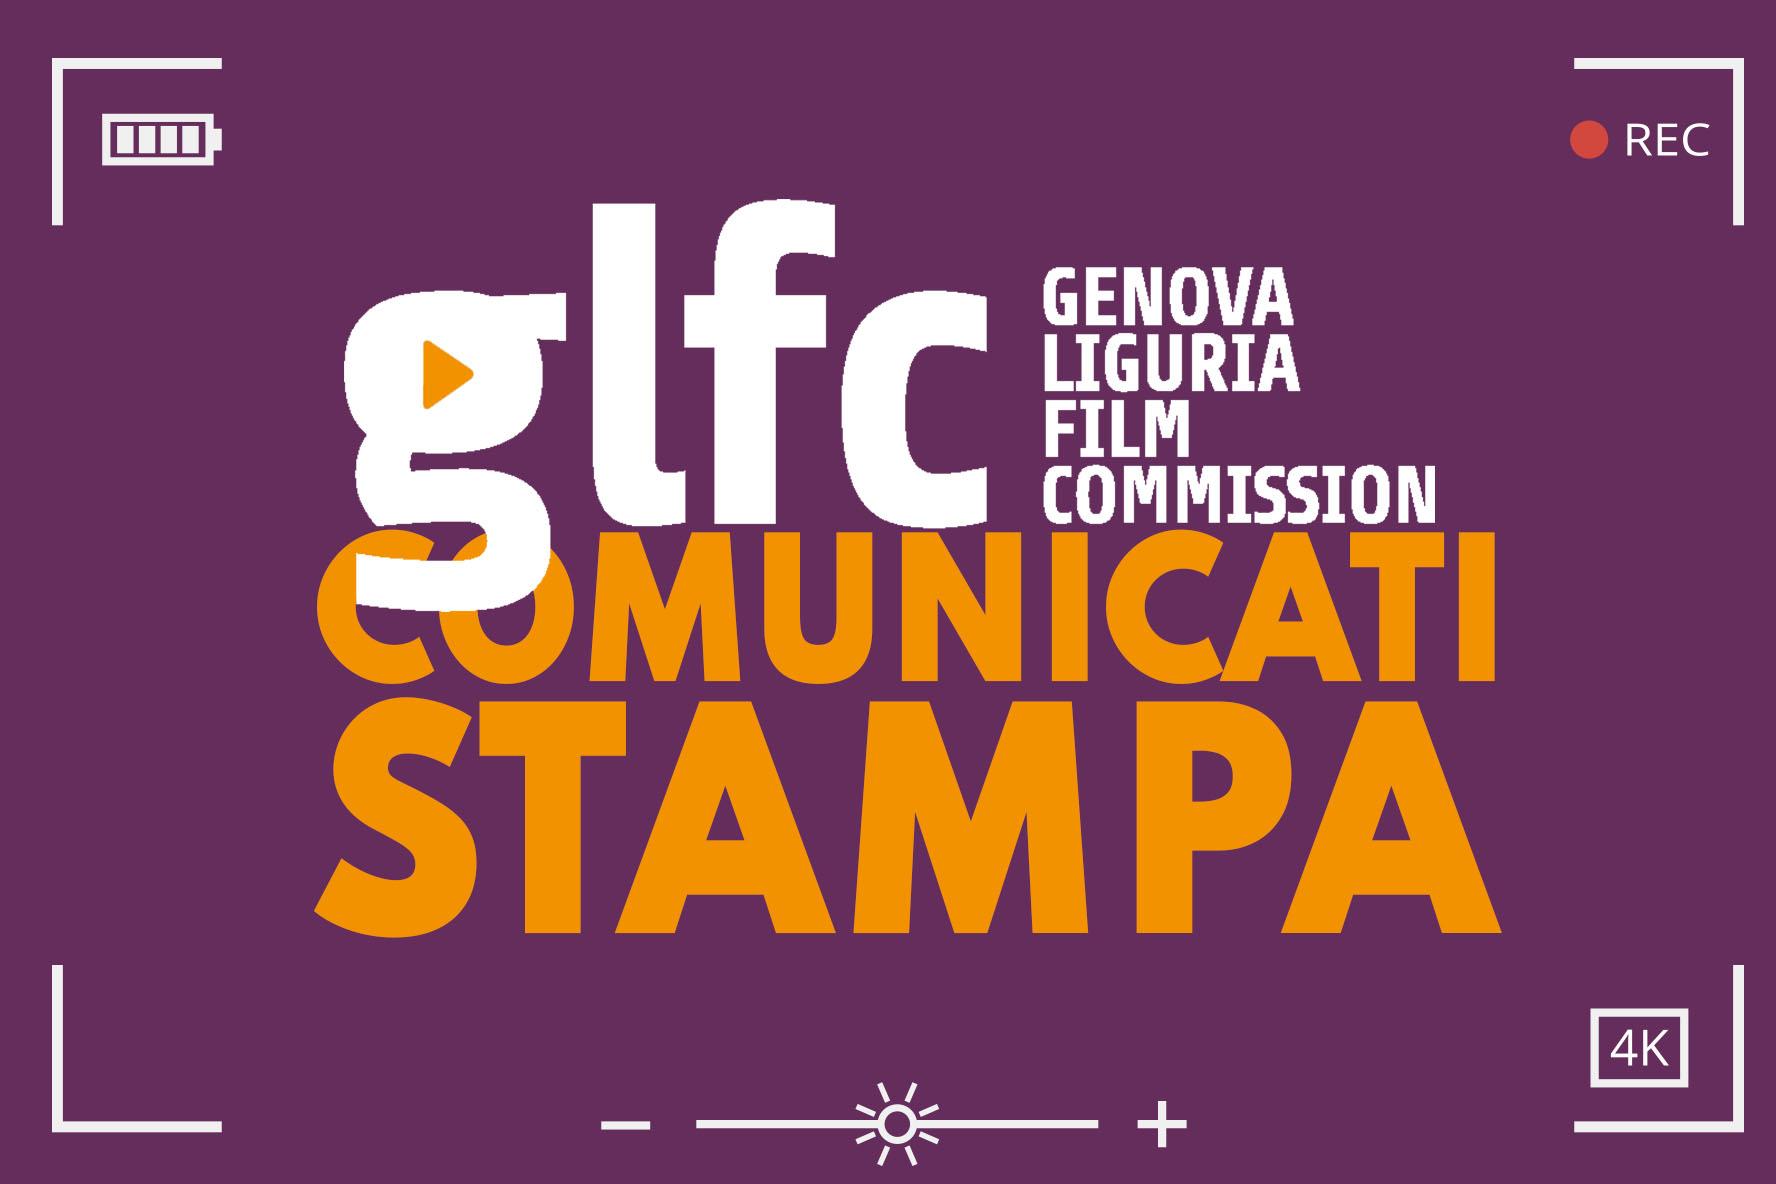 GLFC comunicati stampa